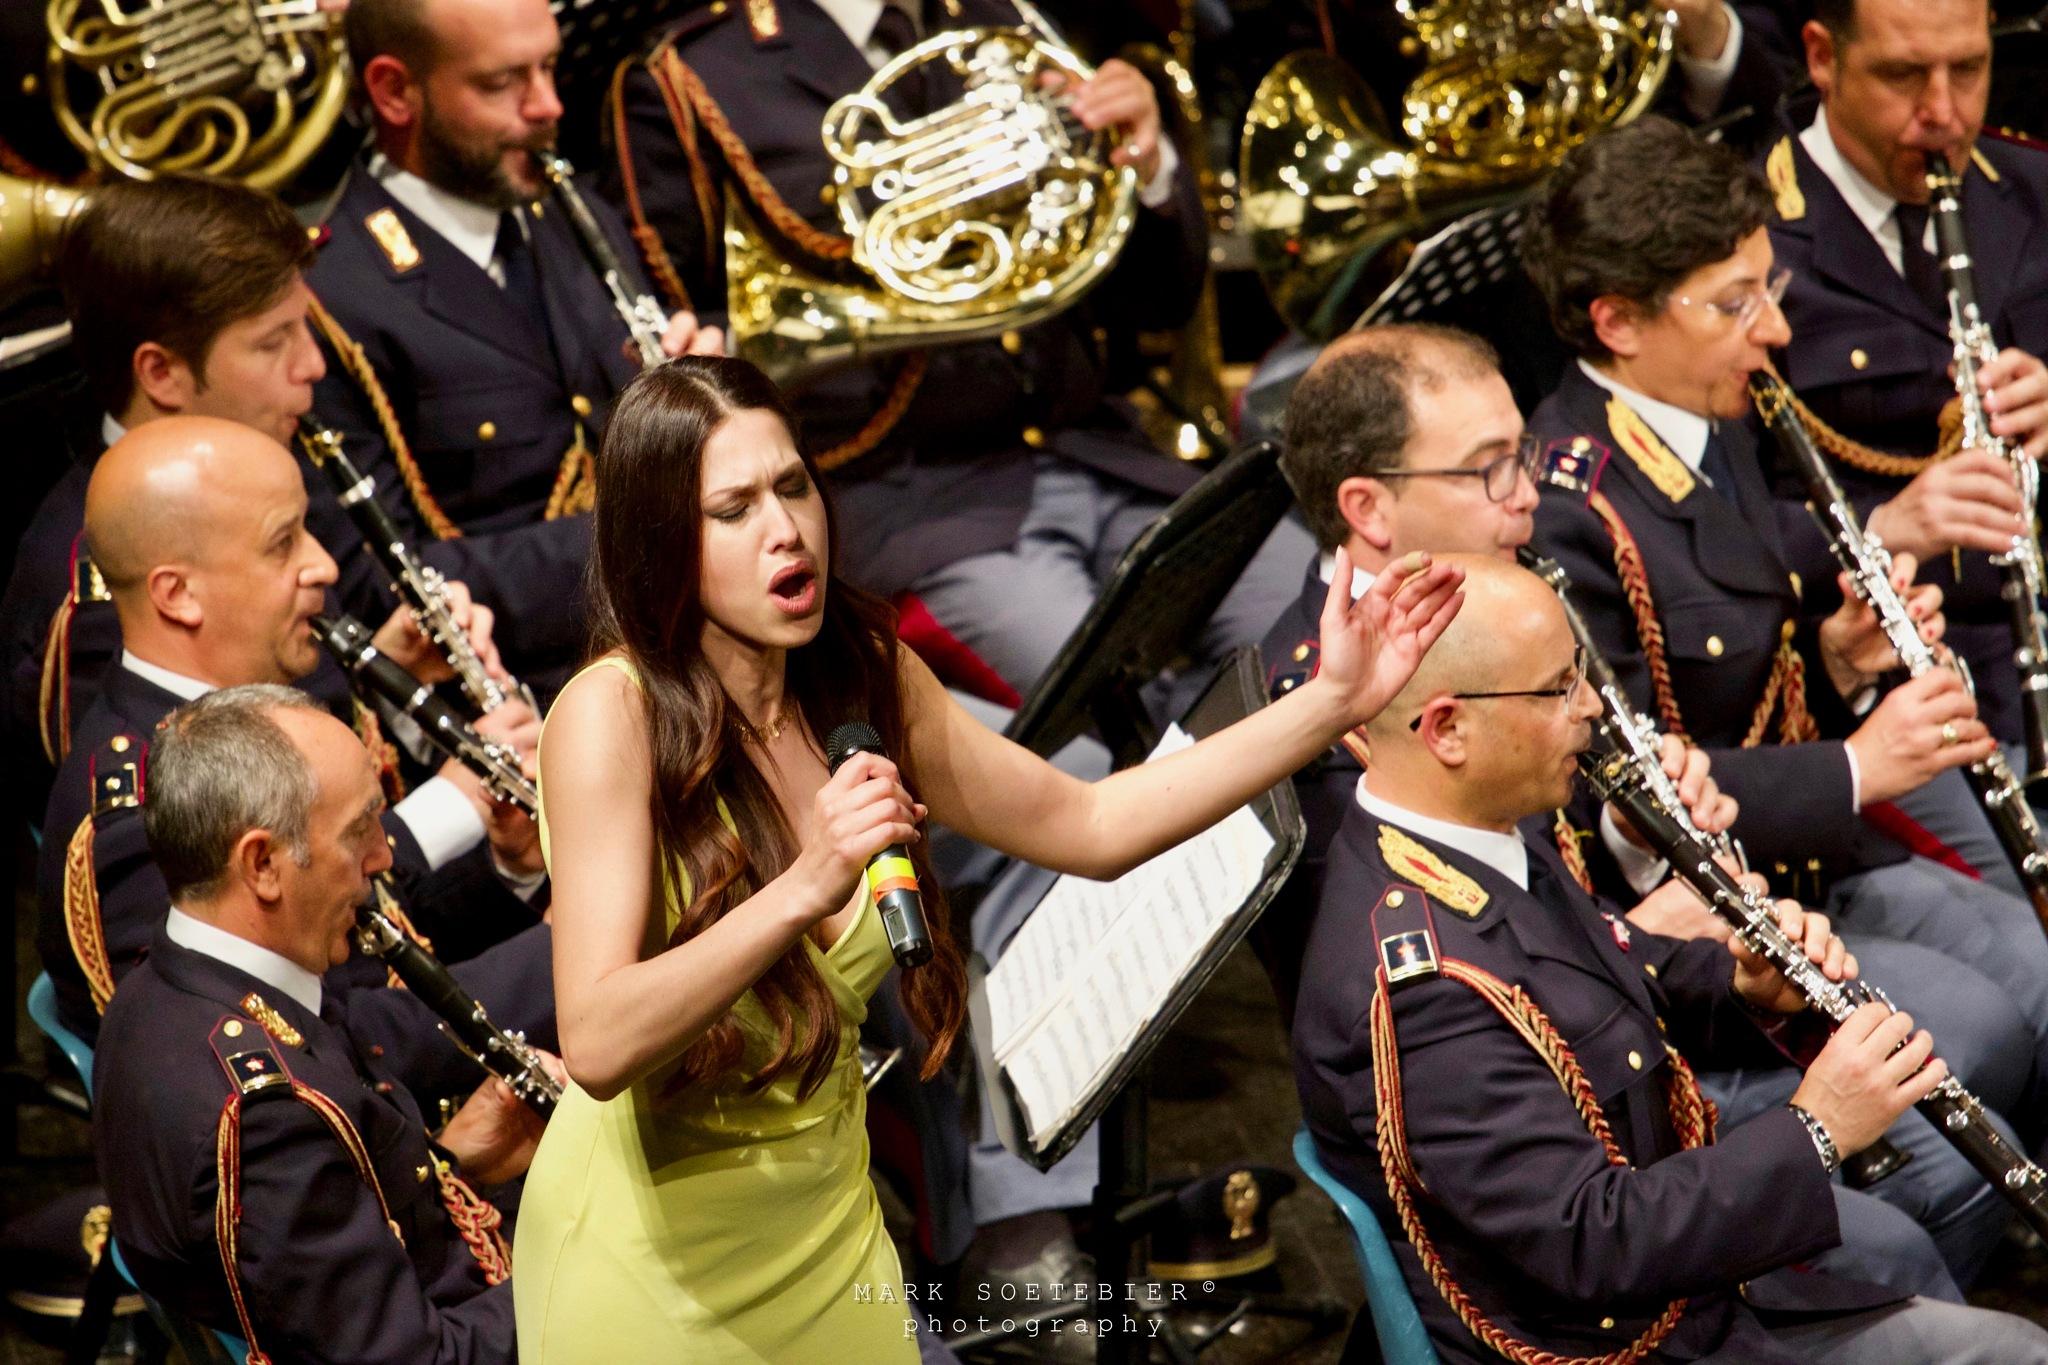 concerto a Siena by MarkSoetebierVideophotography